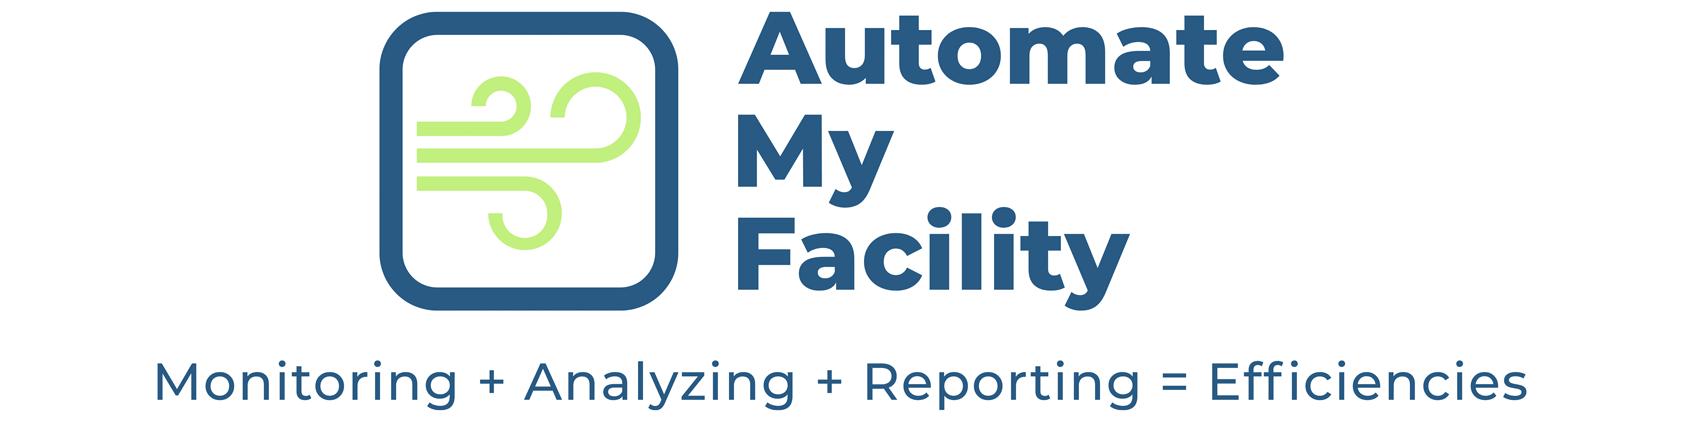 Automate My Facility logo